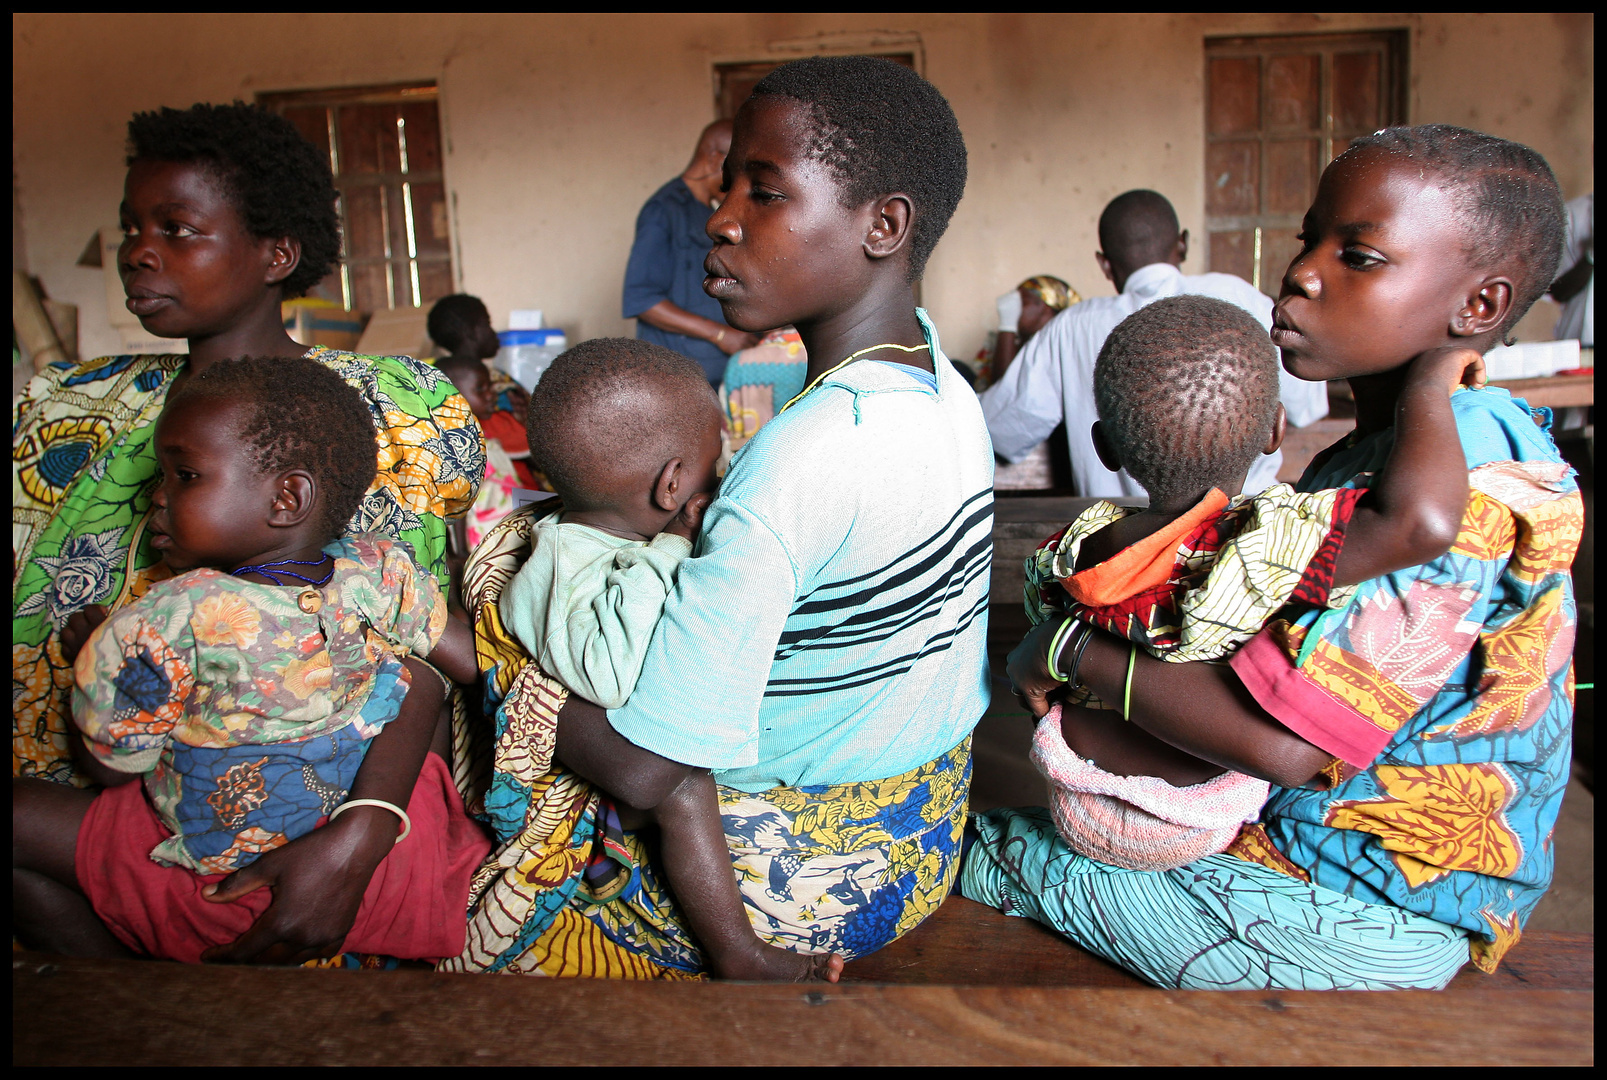 Congo - Programme de vaccination par l'ONG MEDAIR